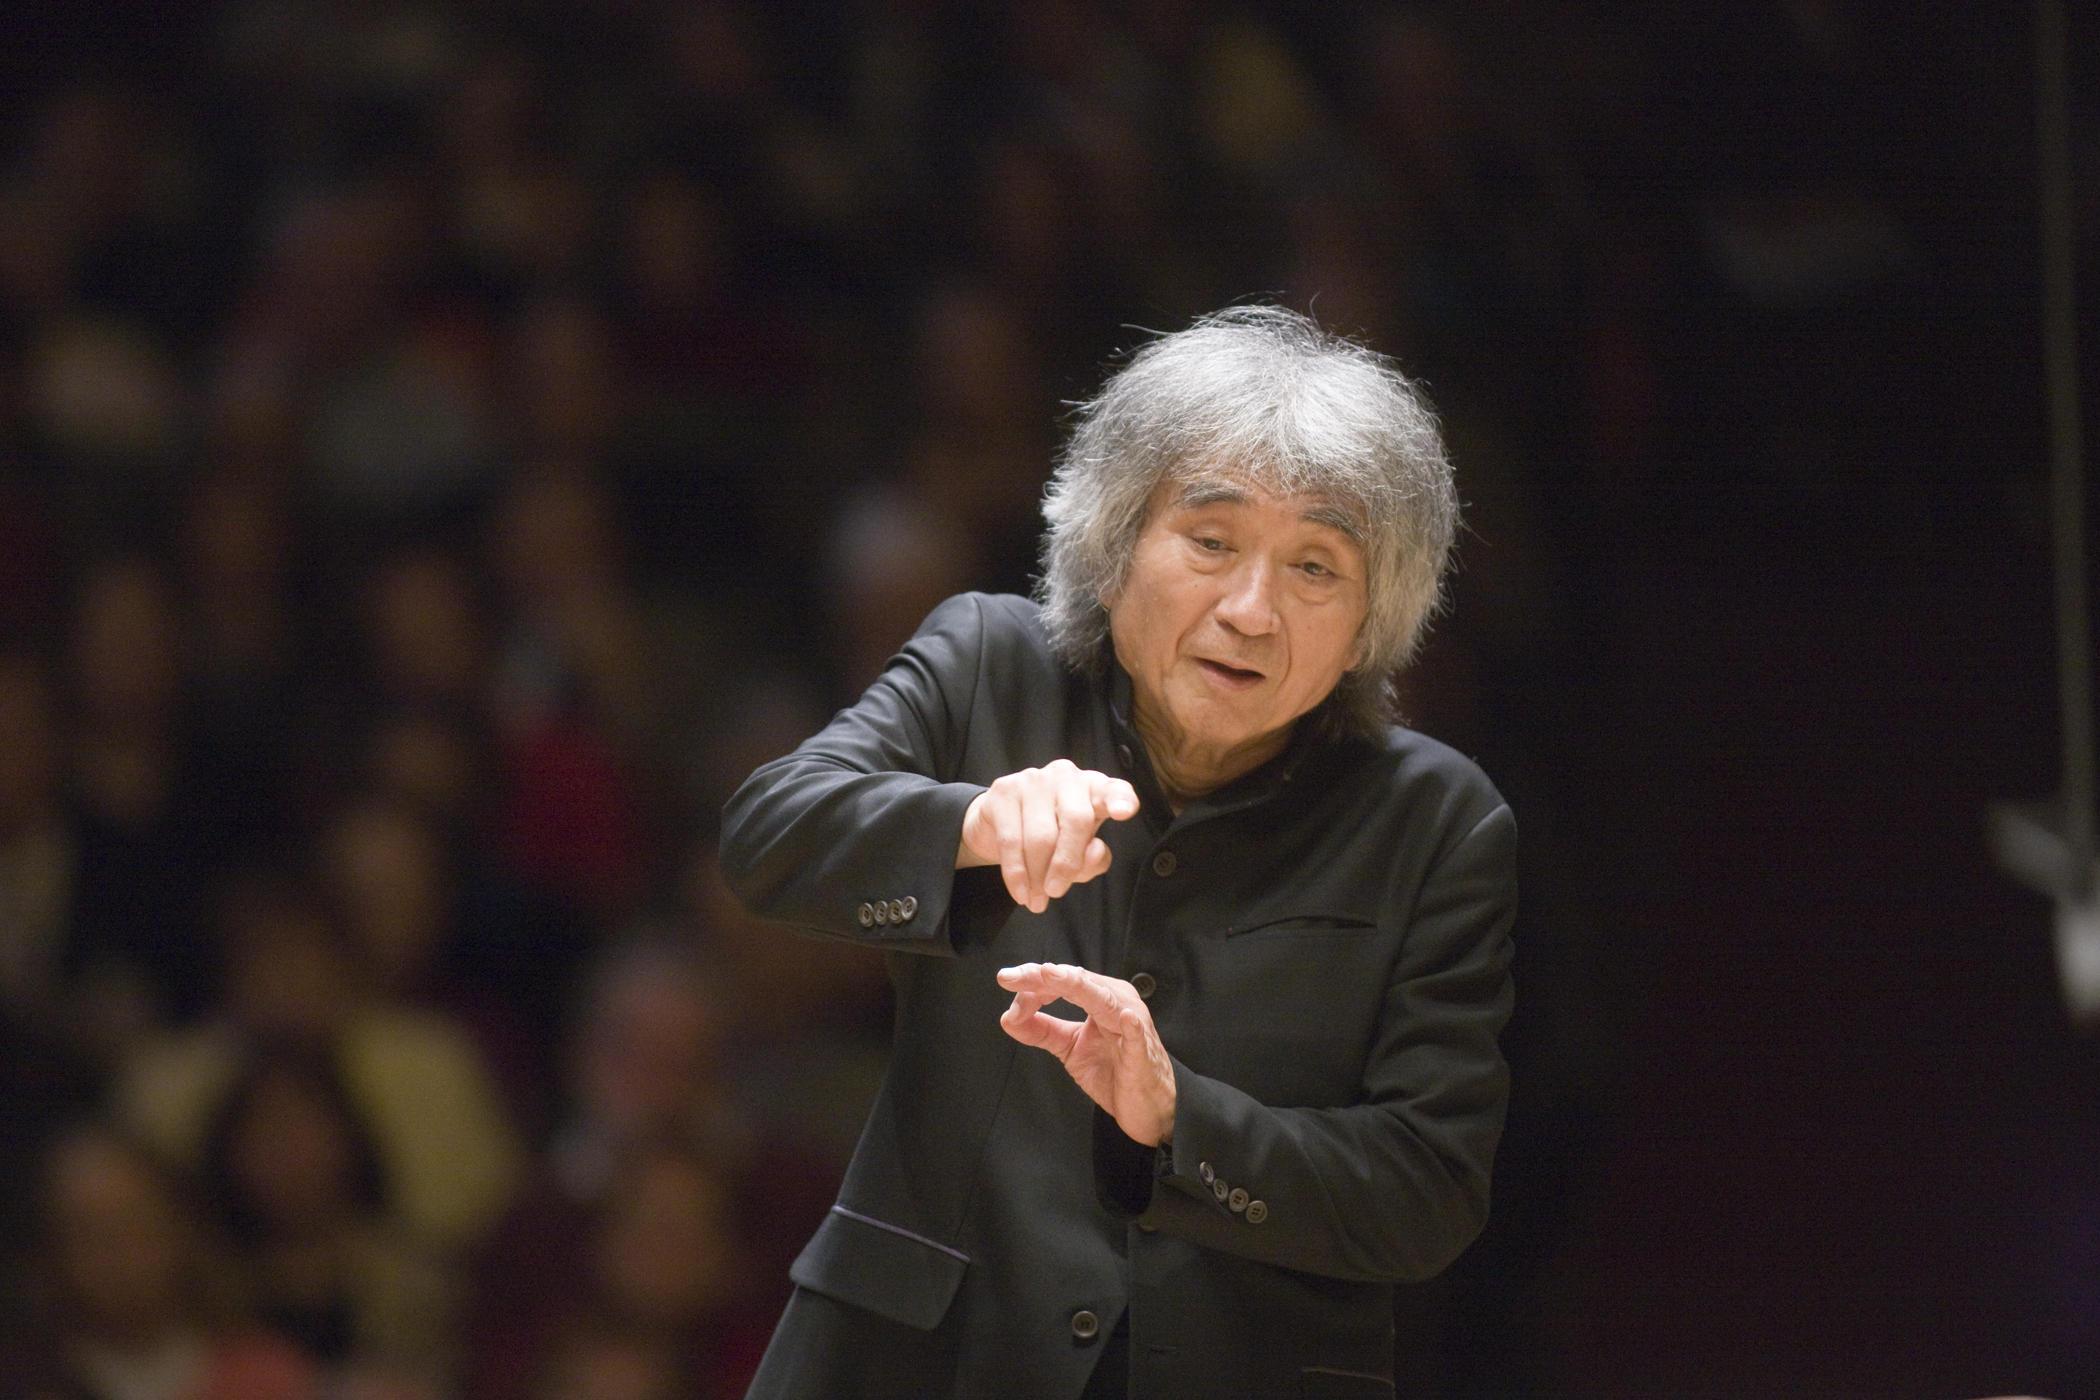 Ozawa Seiji